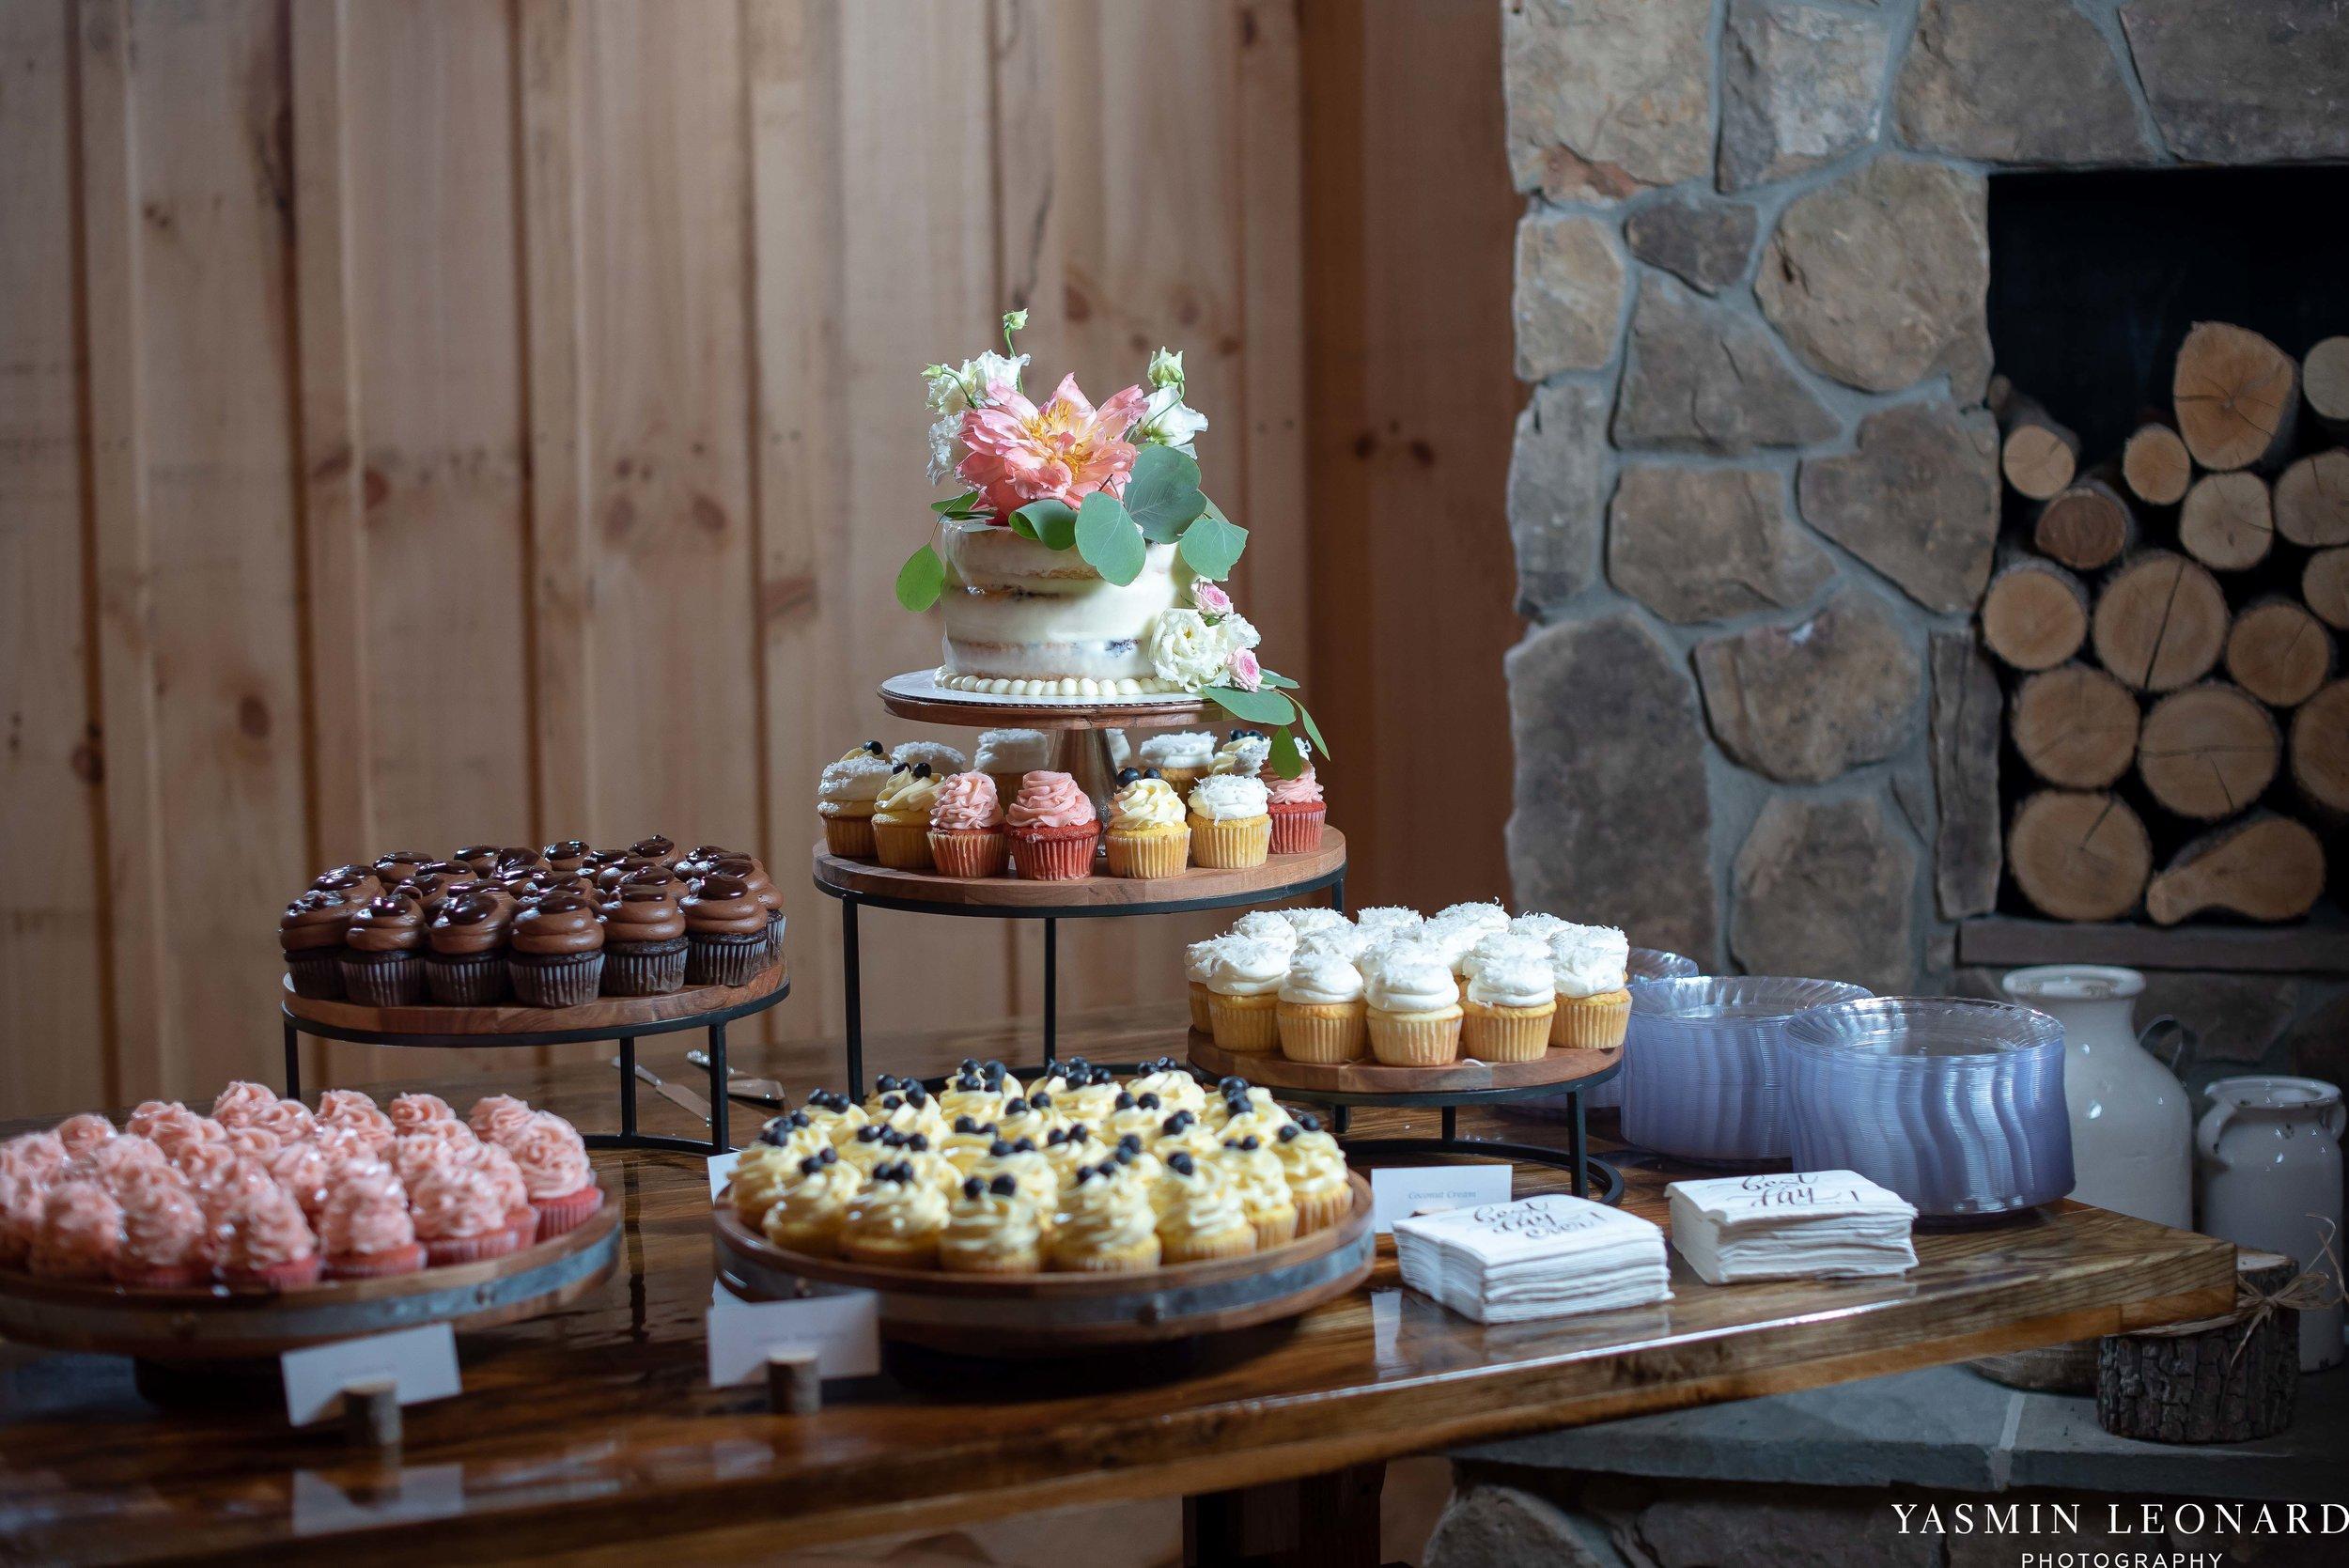 Old Homeplace Vineyard - NC Weddings - Outdoor Summer Weddings - Peony Boutique - Vineyard Wedding - NC Photographer - Yasmin Leonard Photography-5.jpg